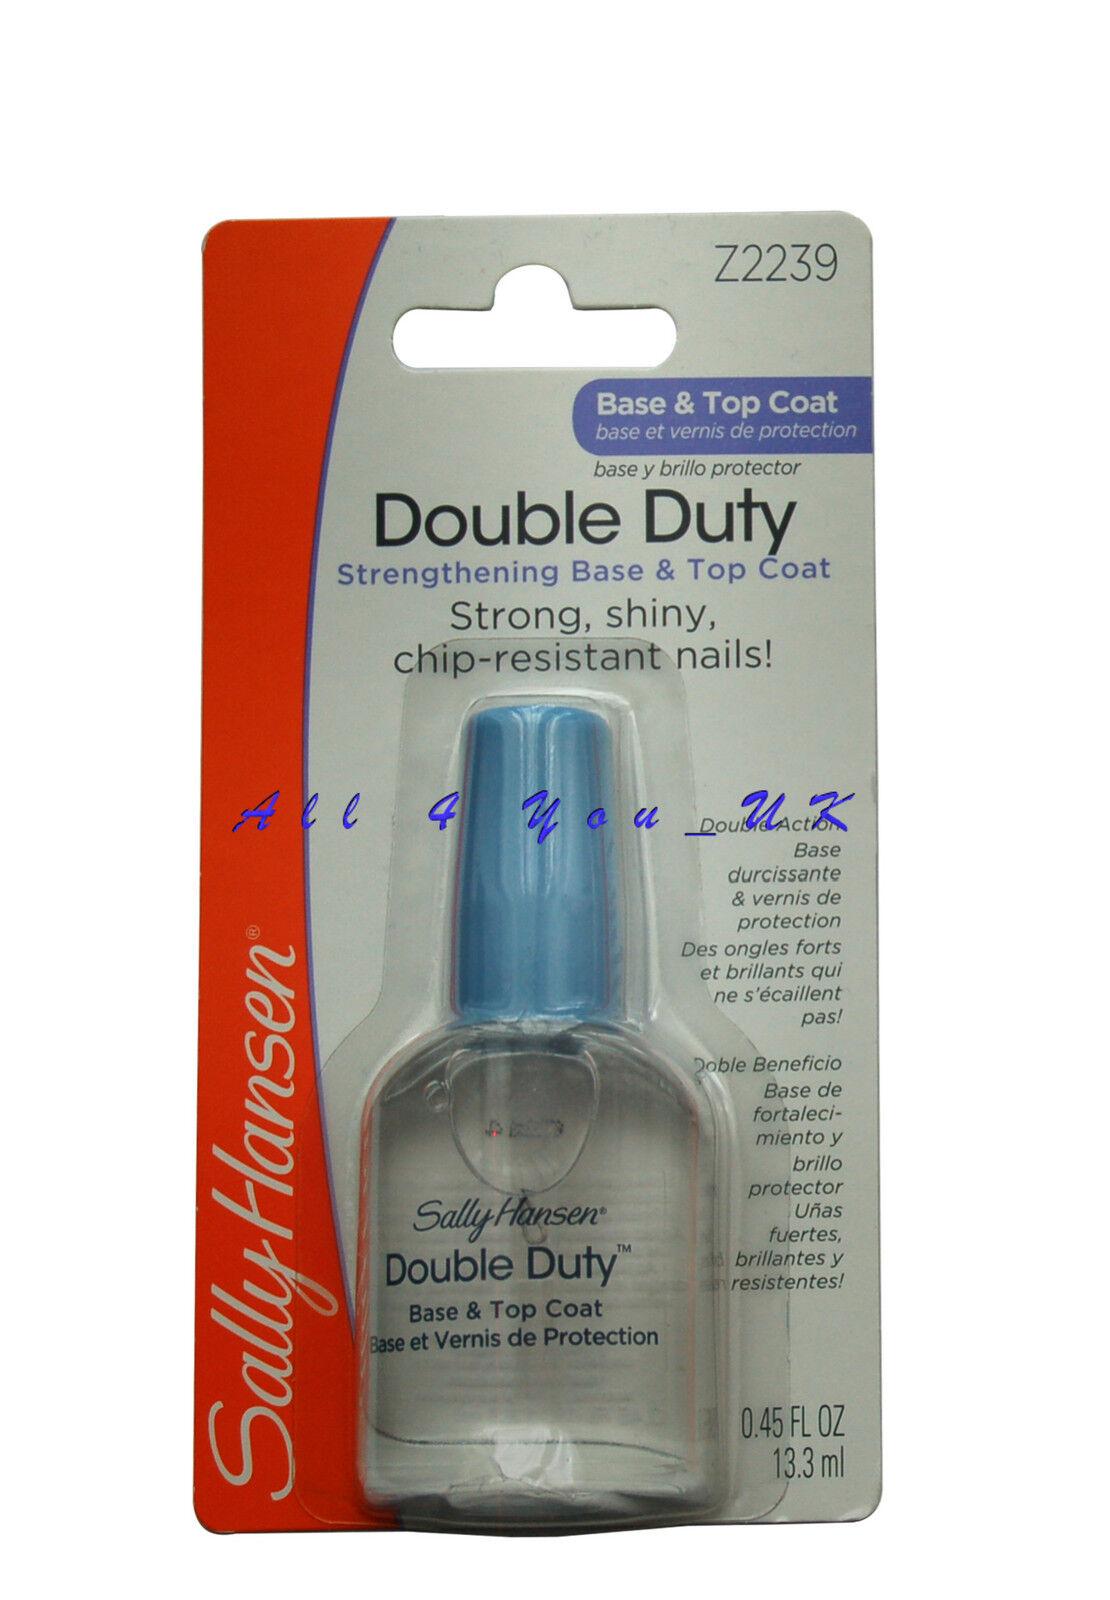 Esmalte Sally Hansen Double Duty Base & Top Coat 45109 13.3mL